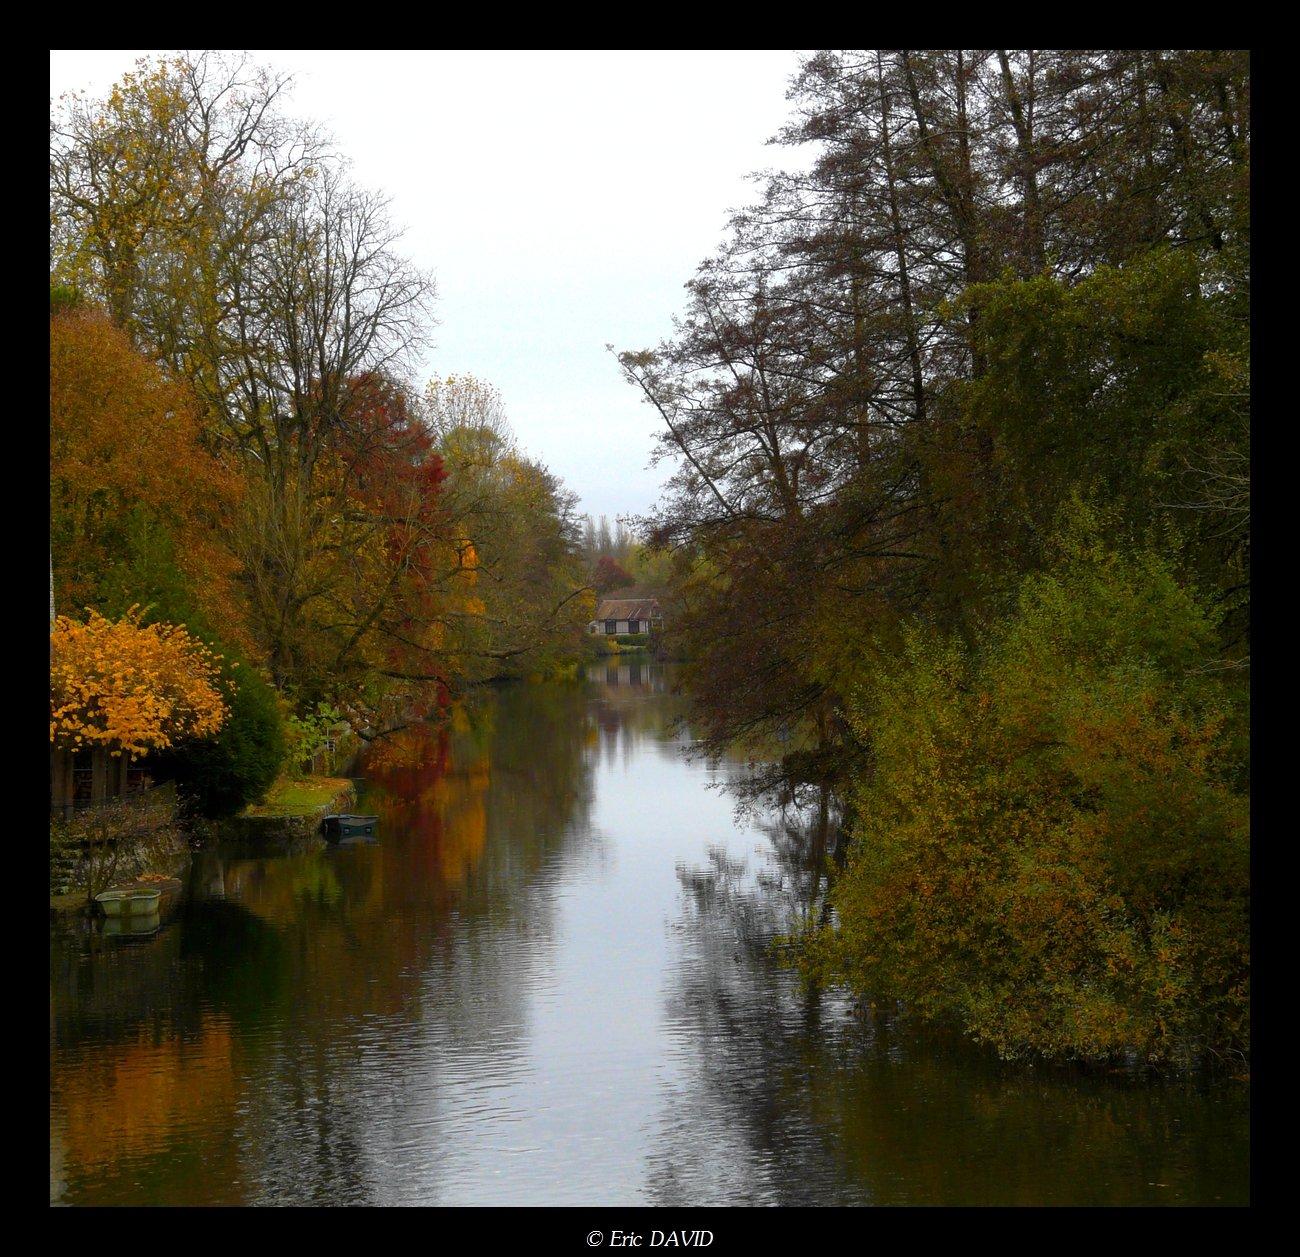 Wallpapers Nature Seasons - Fall Le Loing